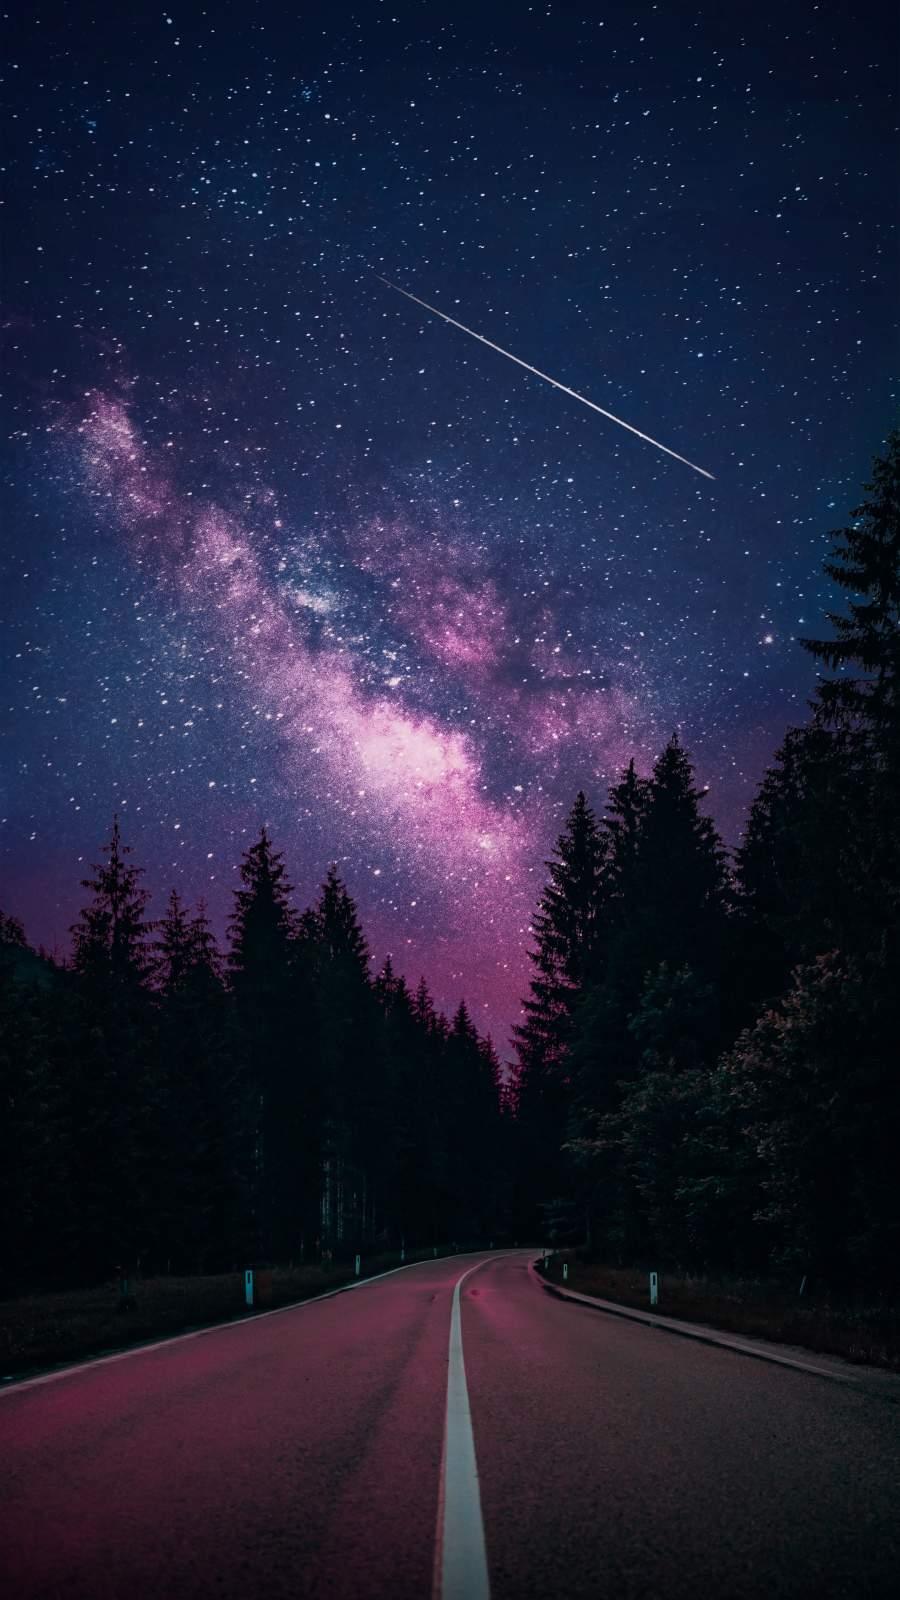 Starry Sky Night Road